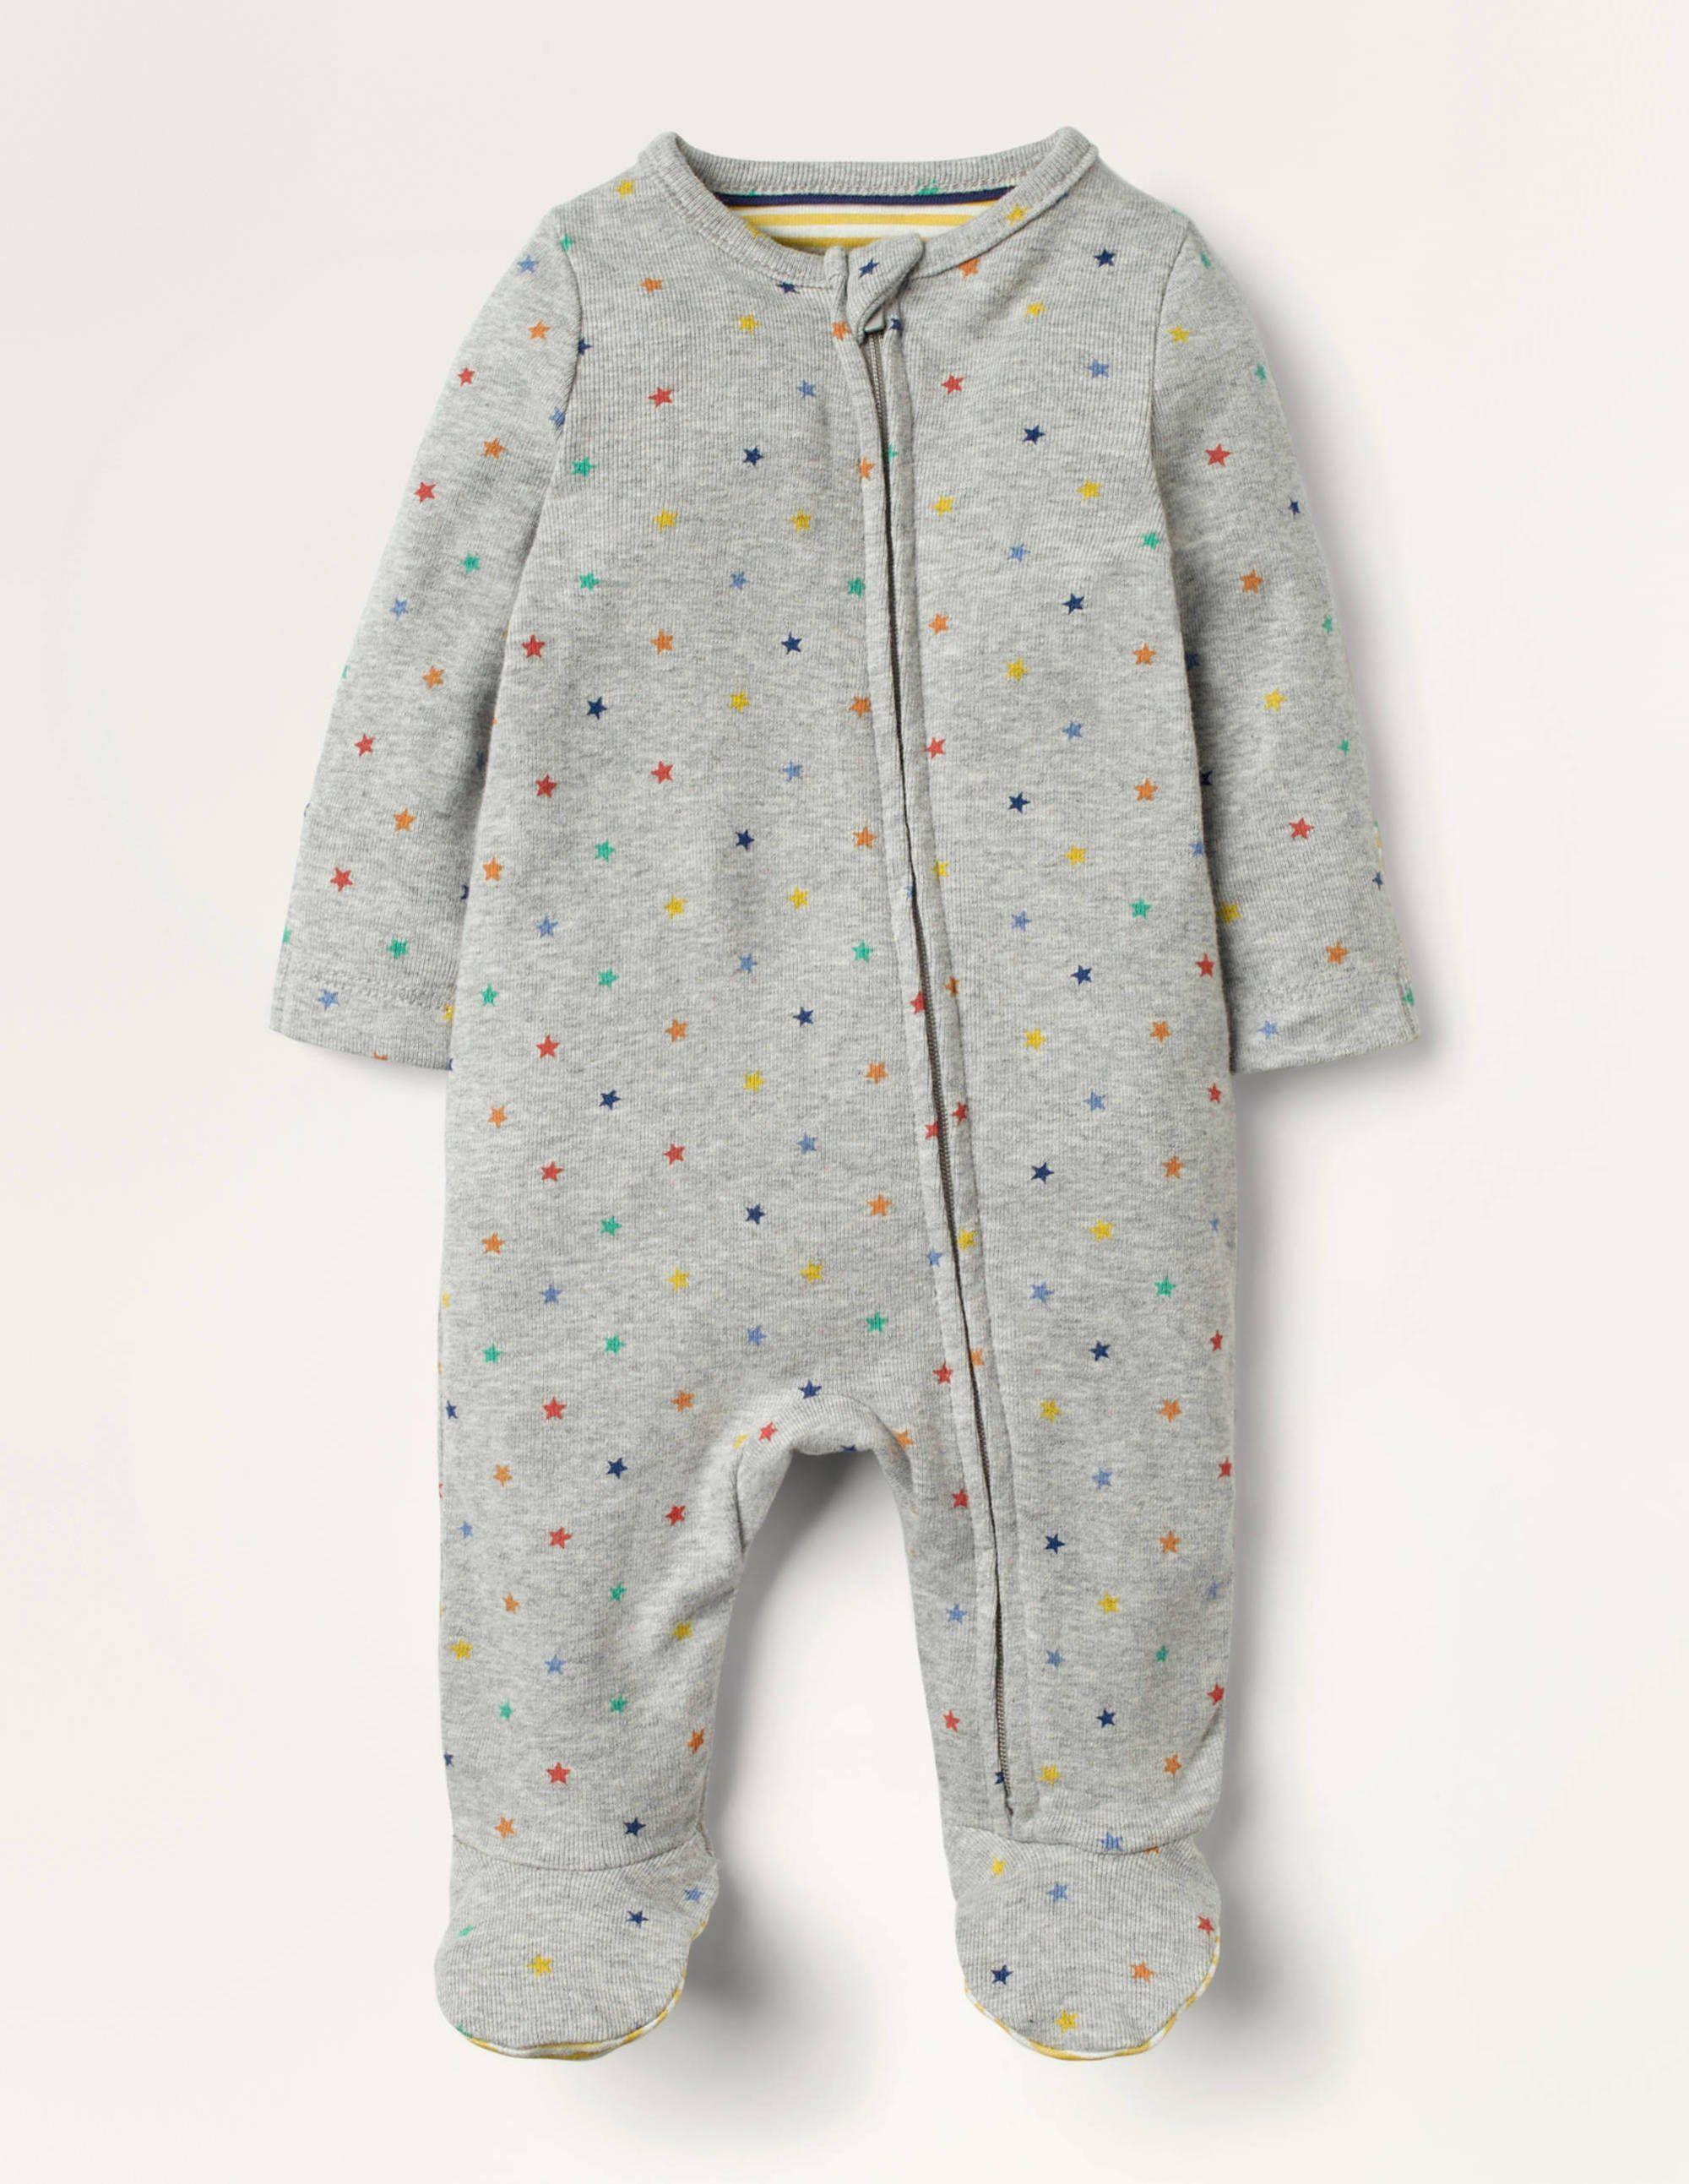 Baby Grenouillère zippée ultra-douce à motif étoile GRY Bébé Boden, Grey - 0-3m